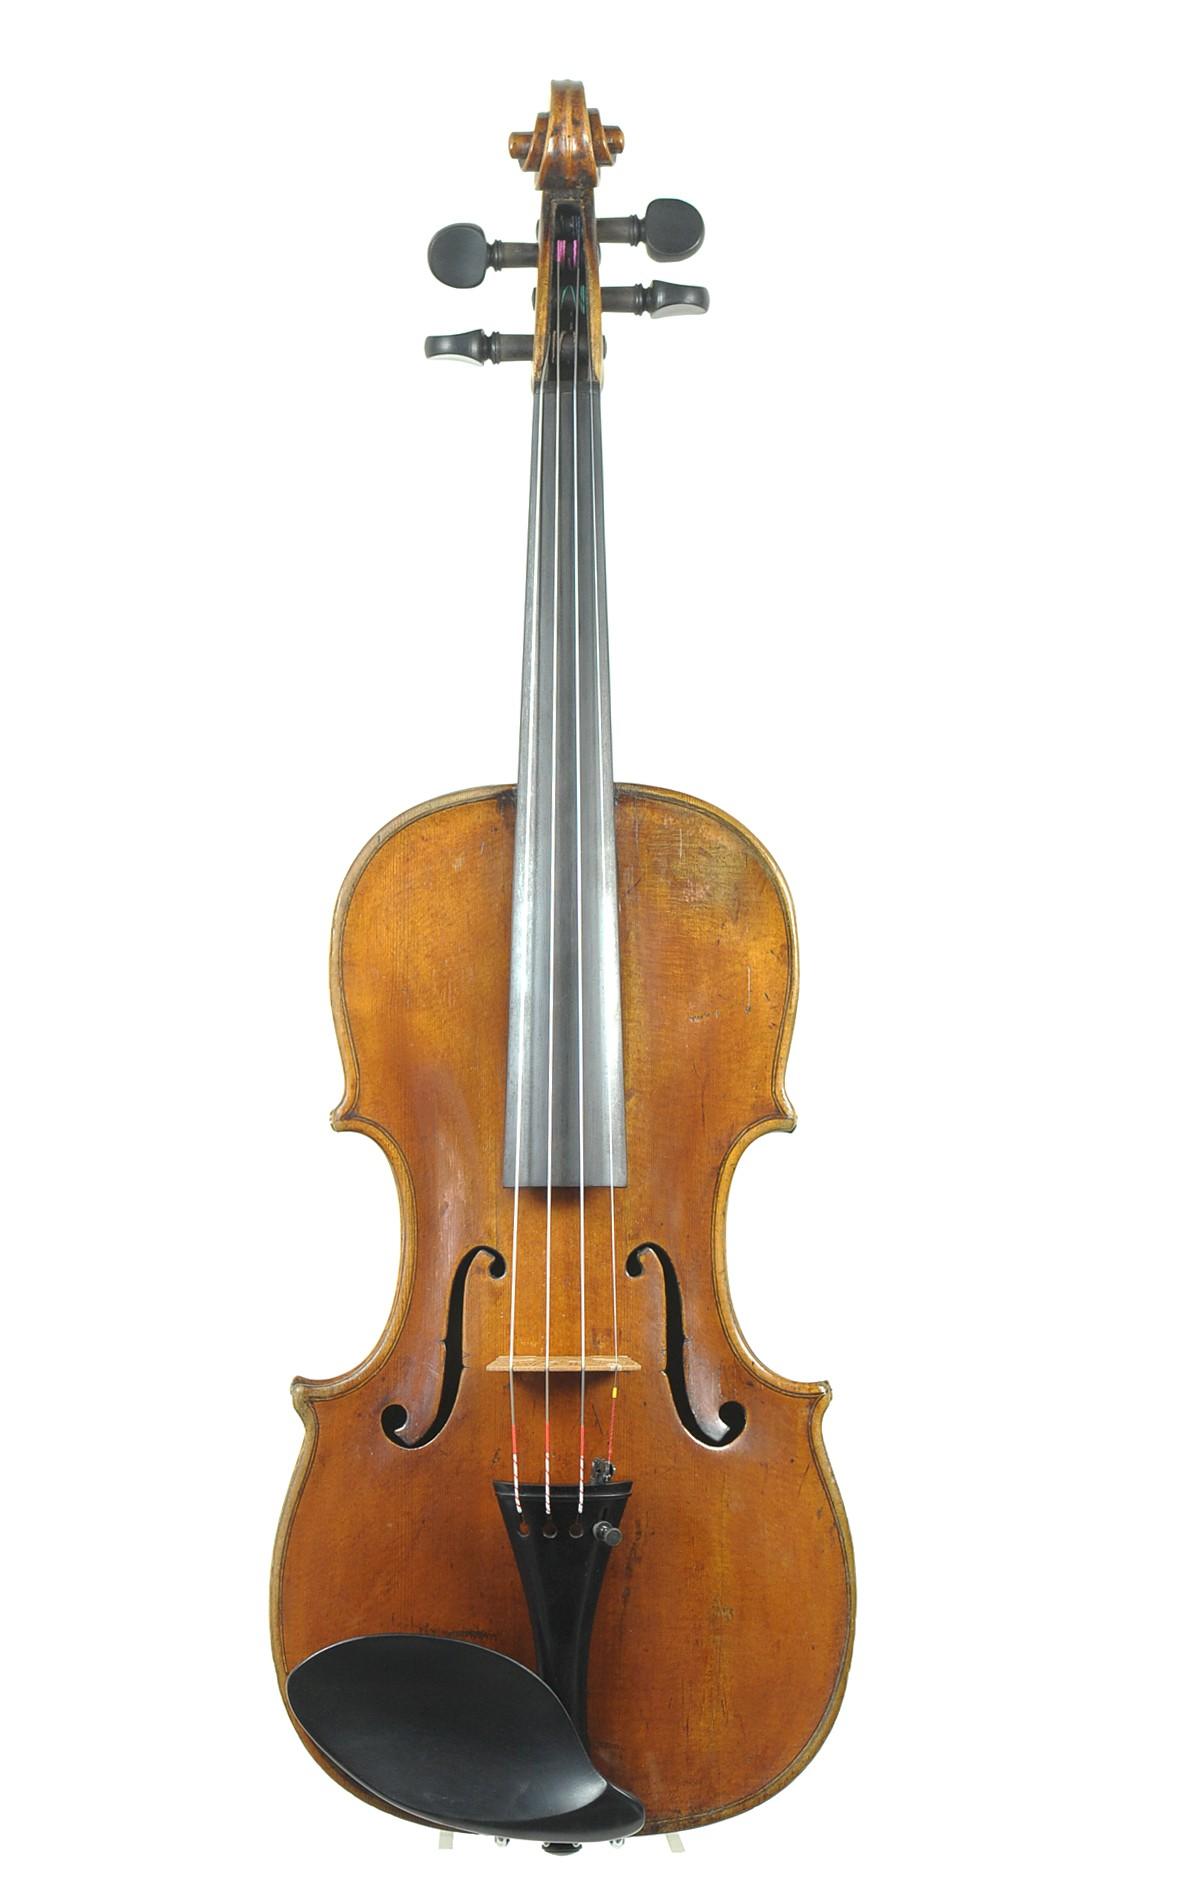 Violin by Christian Friedrich Meinel - table